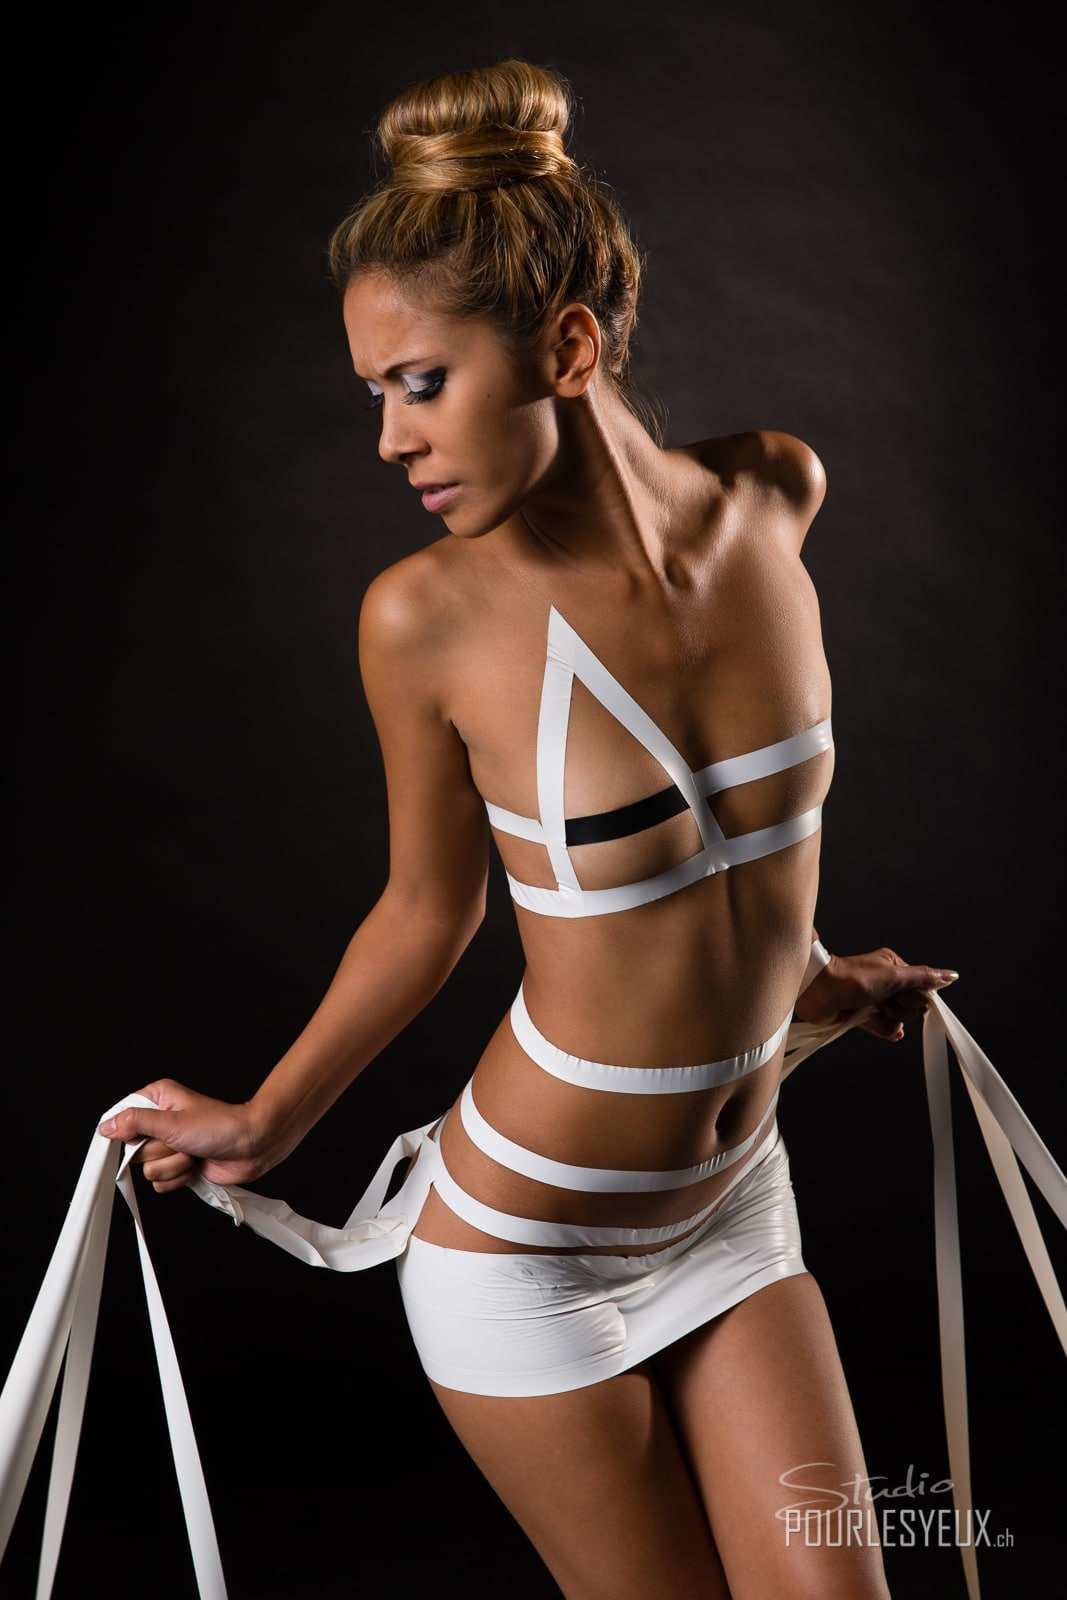 jenny suv femme genève modèle mannequin suisse maquilleuse danseuse nu charme strapping